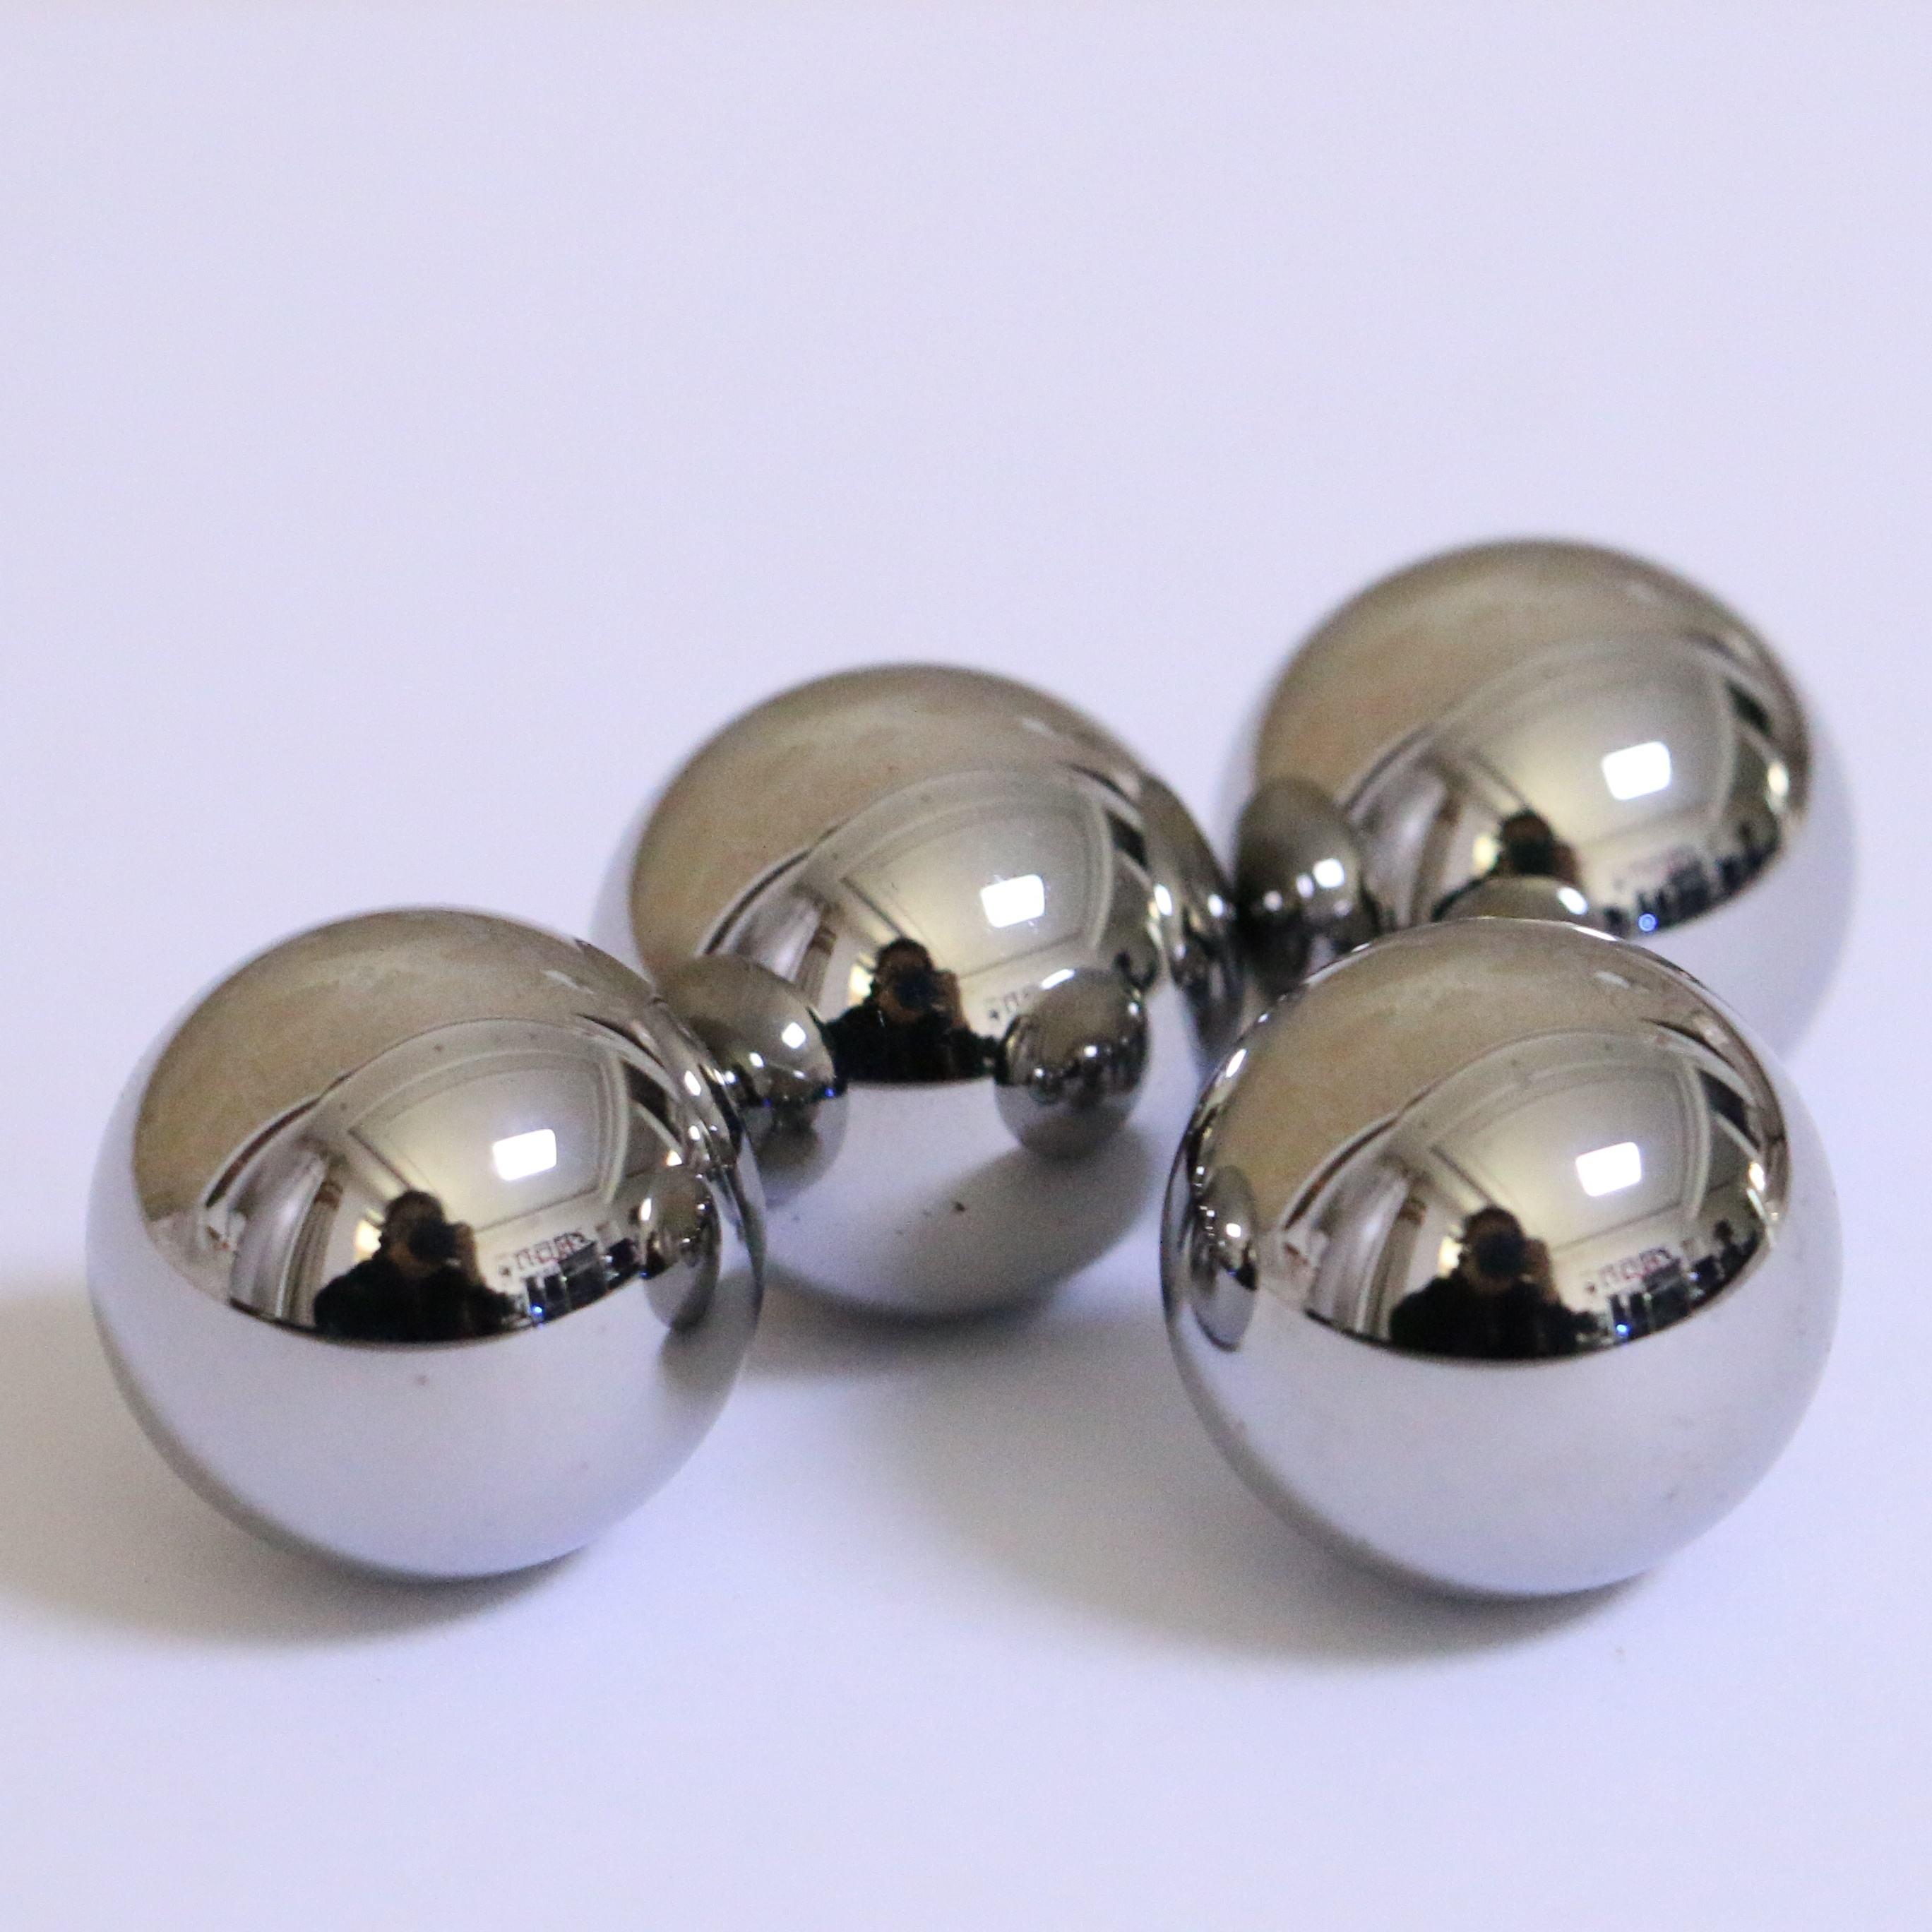 Loose Bearing Ball SS316 316 Stainless Steel Bearings Balls G100 QTY 200 7mm